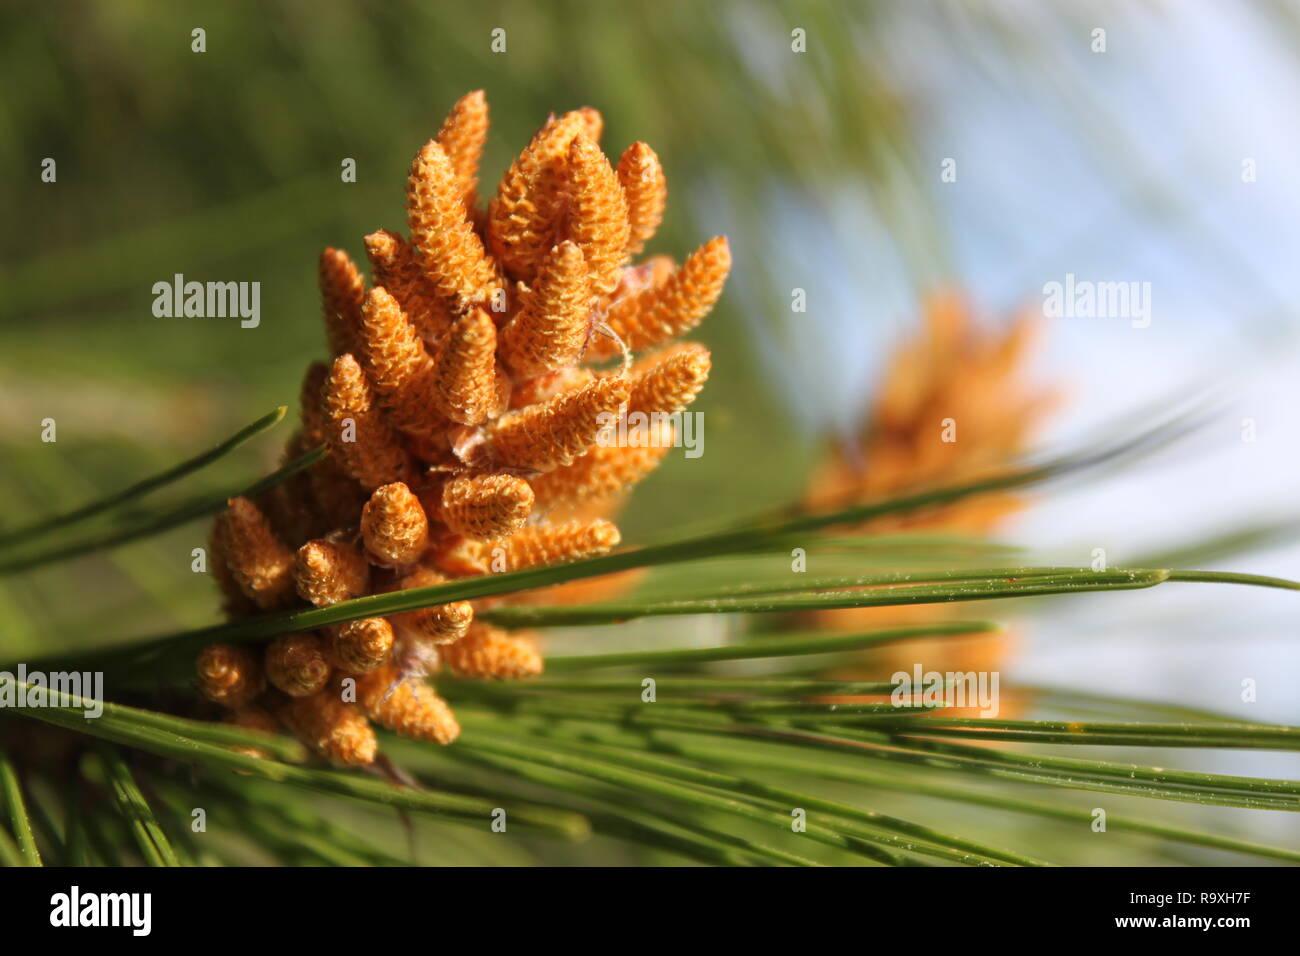 Aleppo pine flower, Pinus halepensis, Mljet Croatia - Stock Image